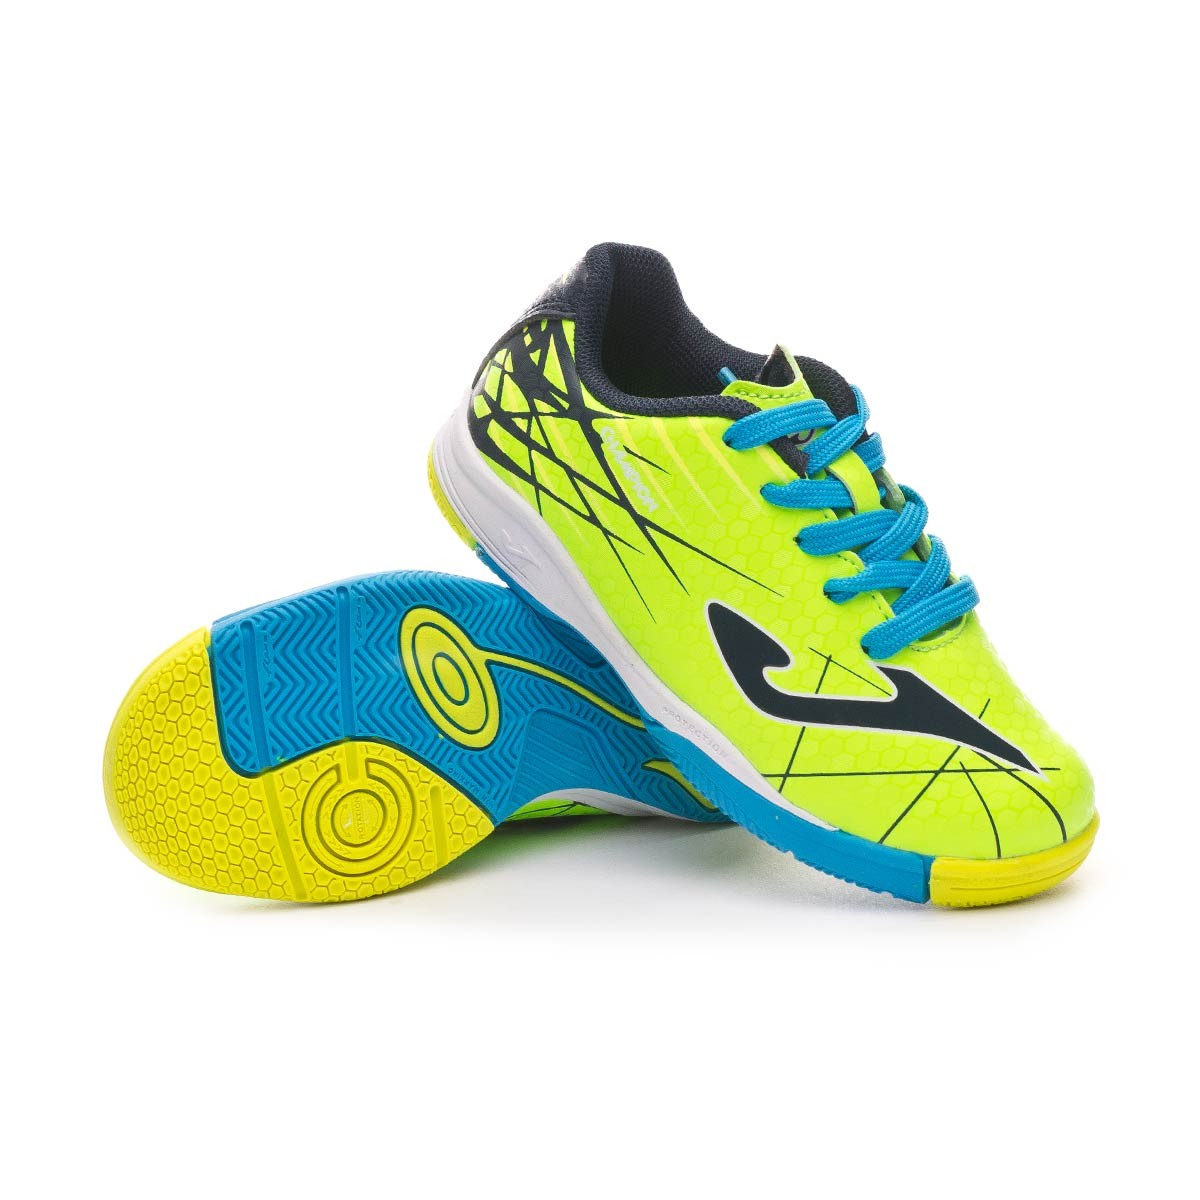 cfd44d093 Futsal Boot Joma Champion Niño Lime-Turquoise - Football store Fútbol  Emotion